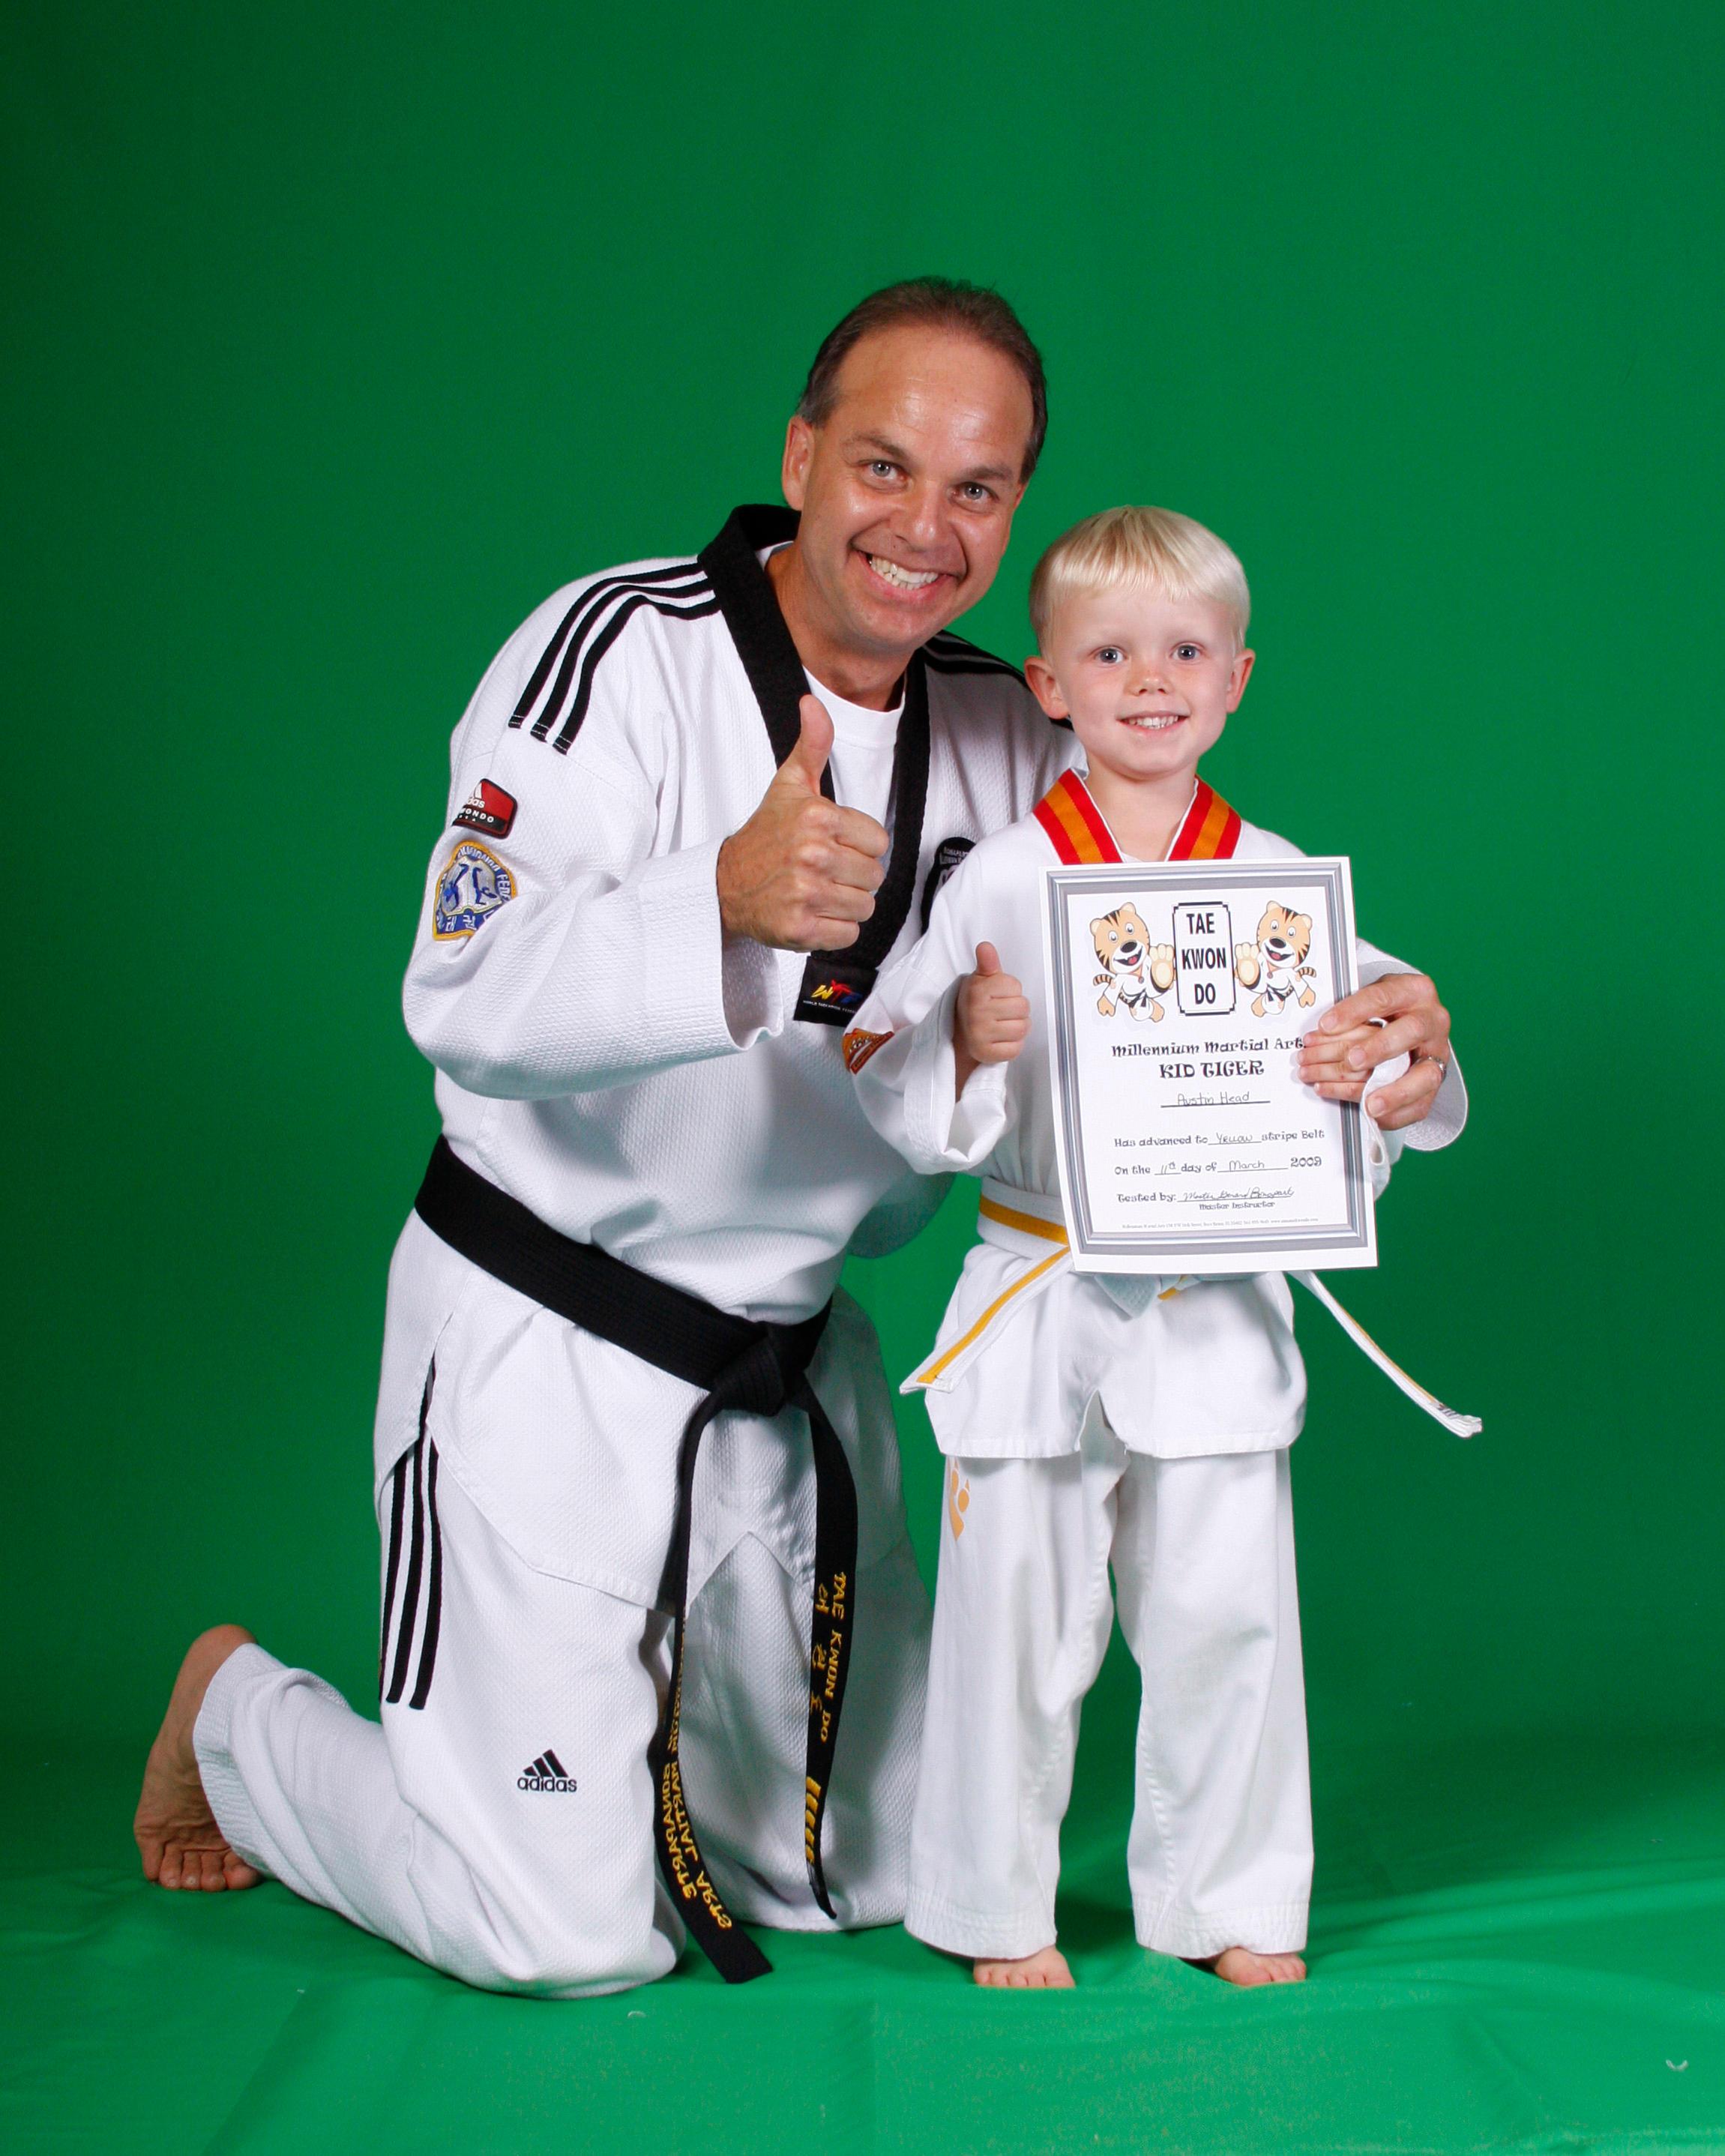 Millennium Martial Arts - Tae Kwon Do image 6